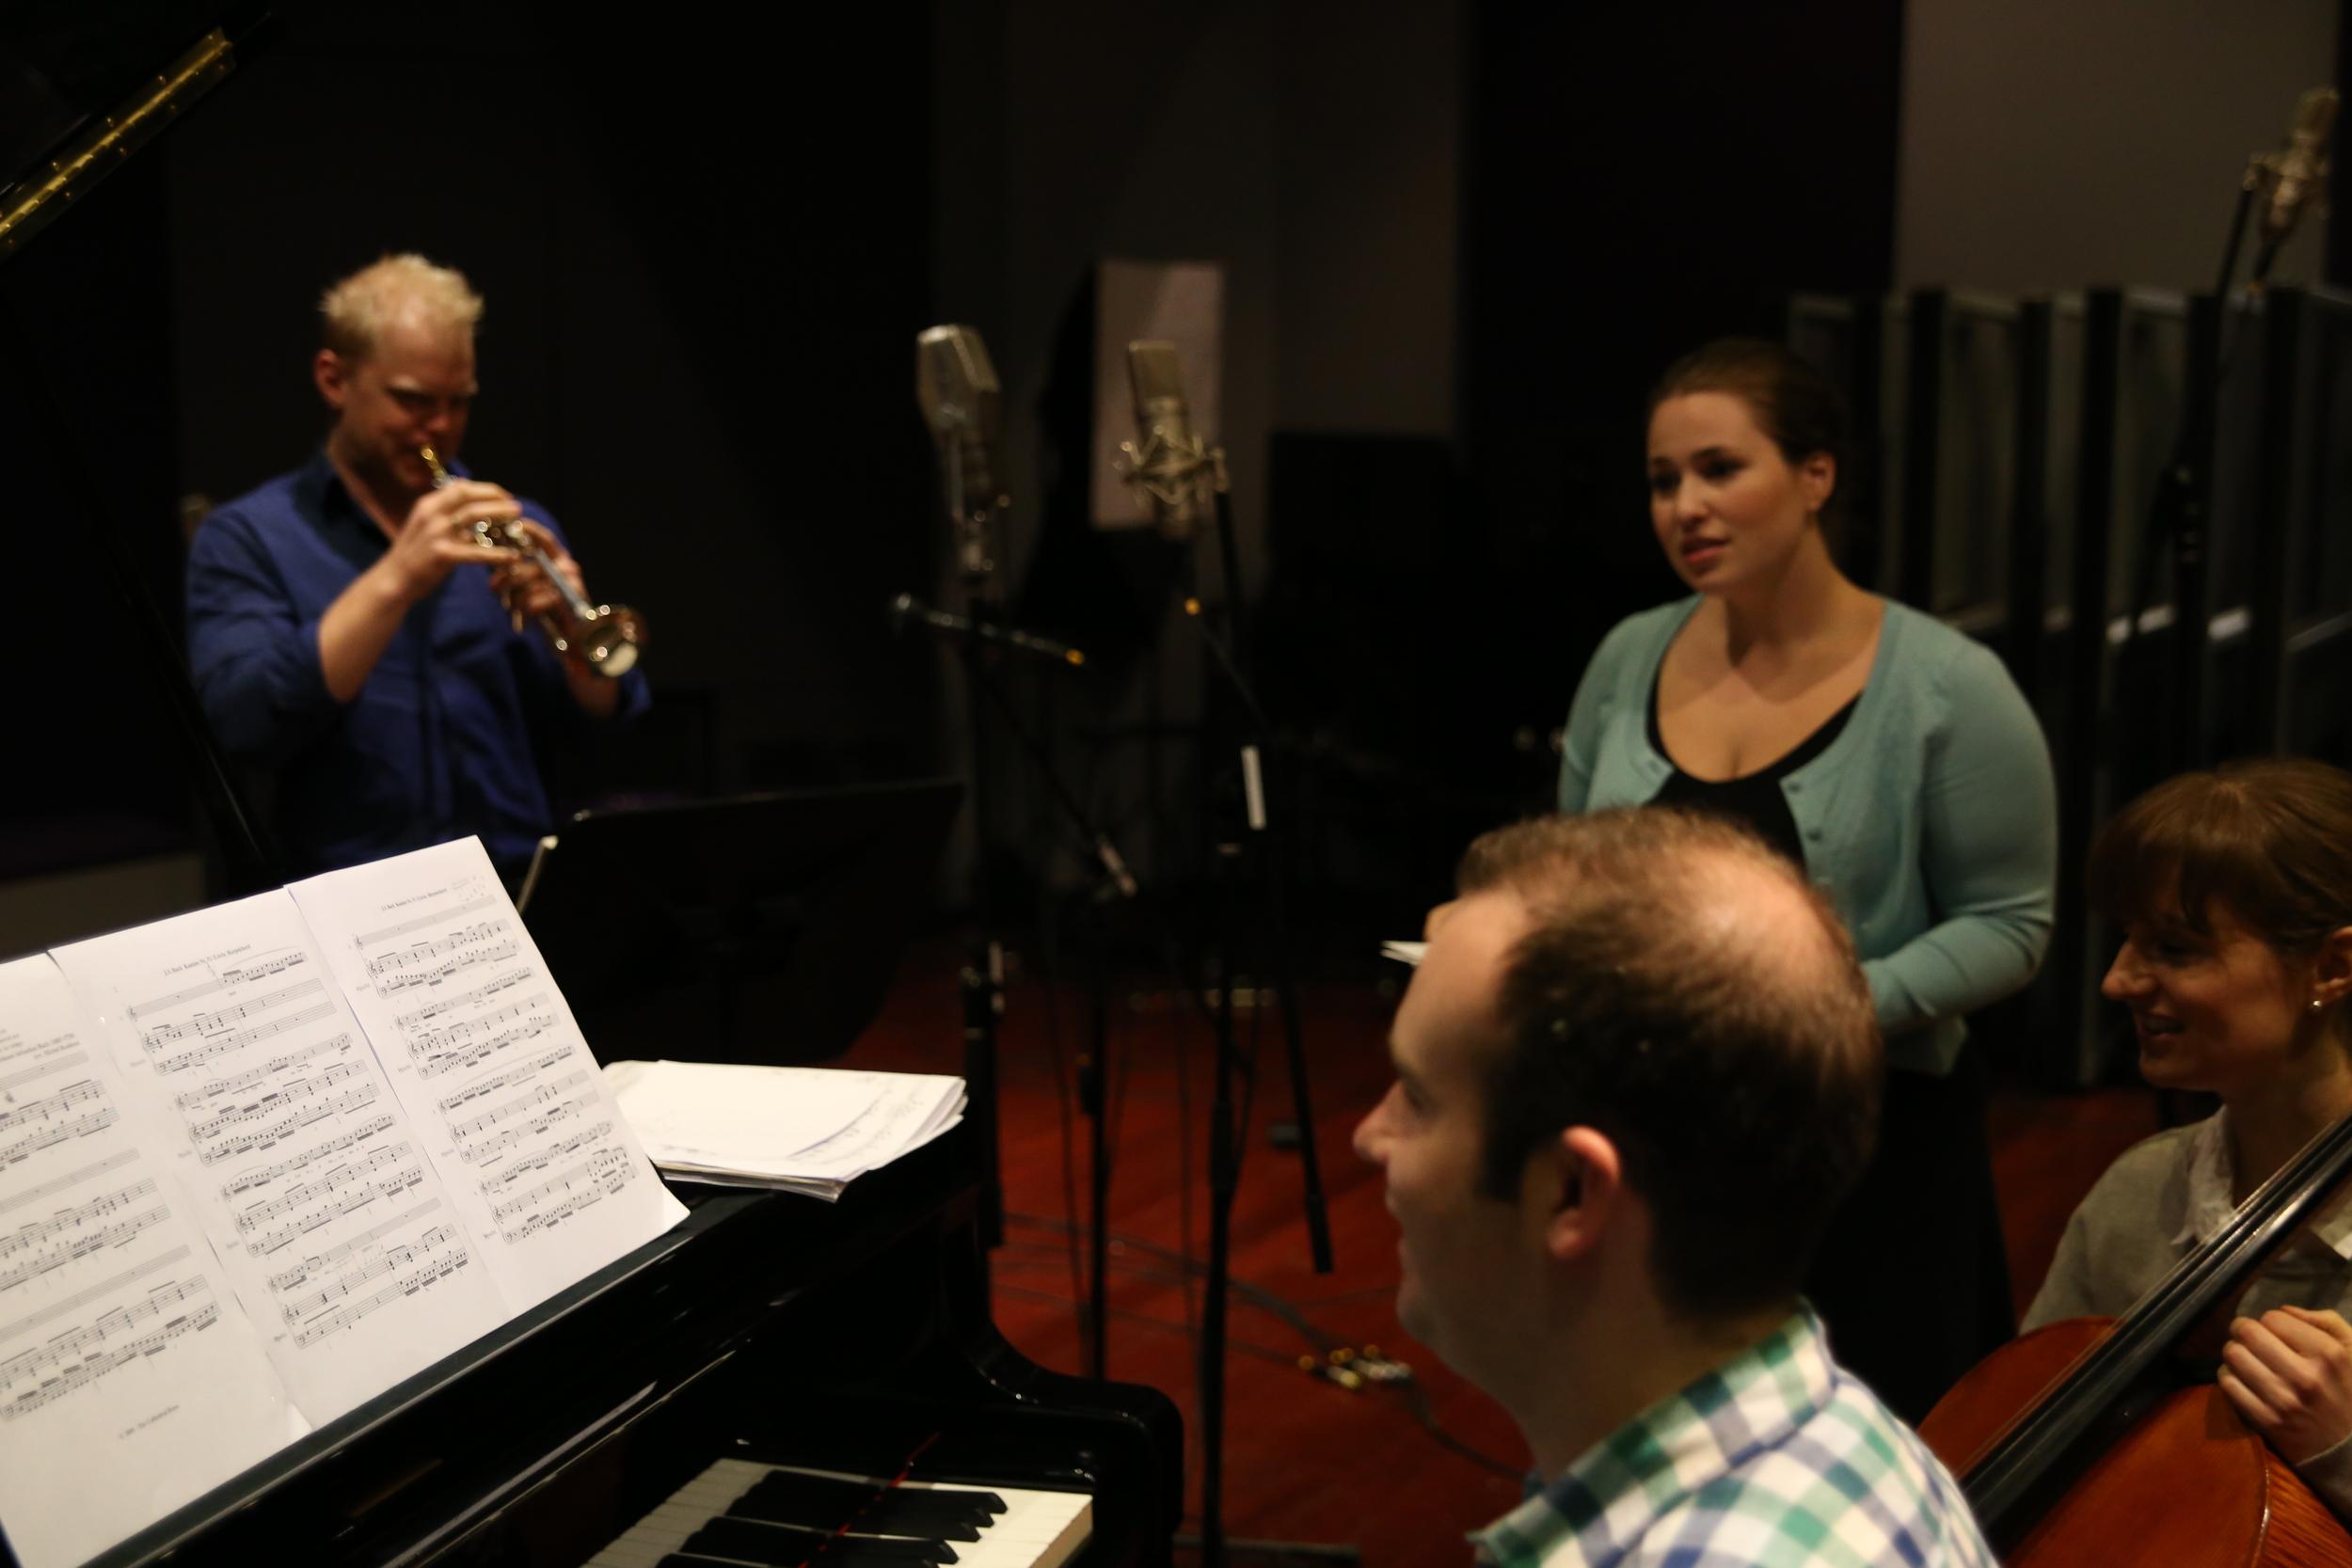 Phill O'Neill recording The Operatic Trumpet